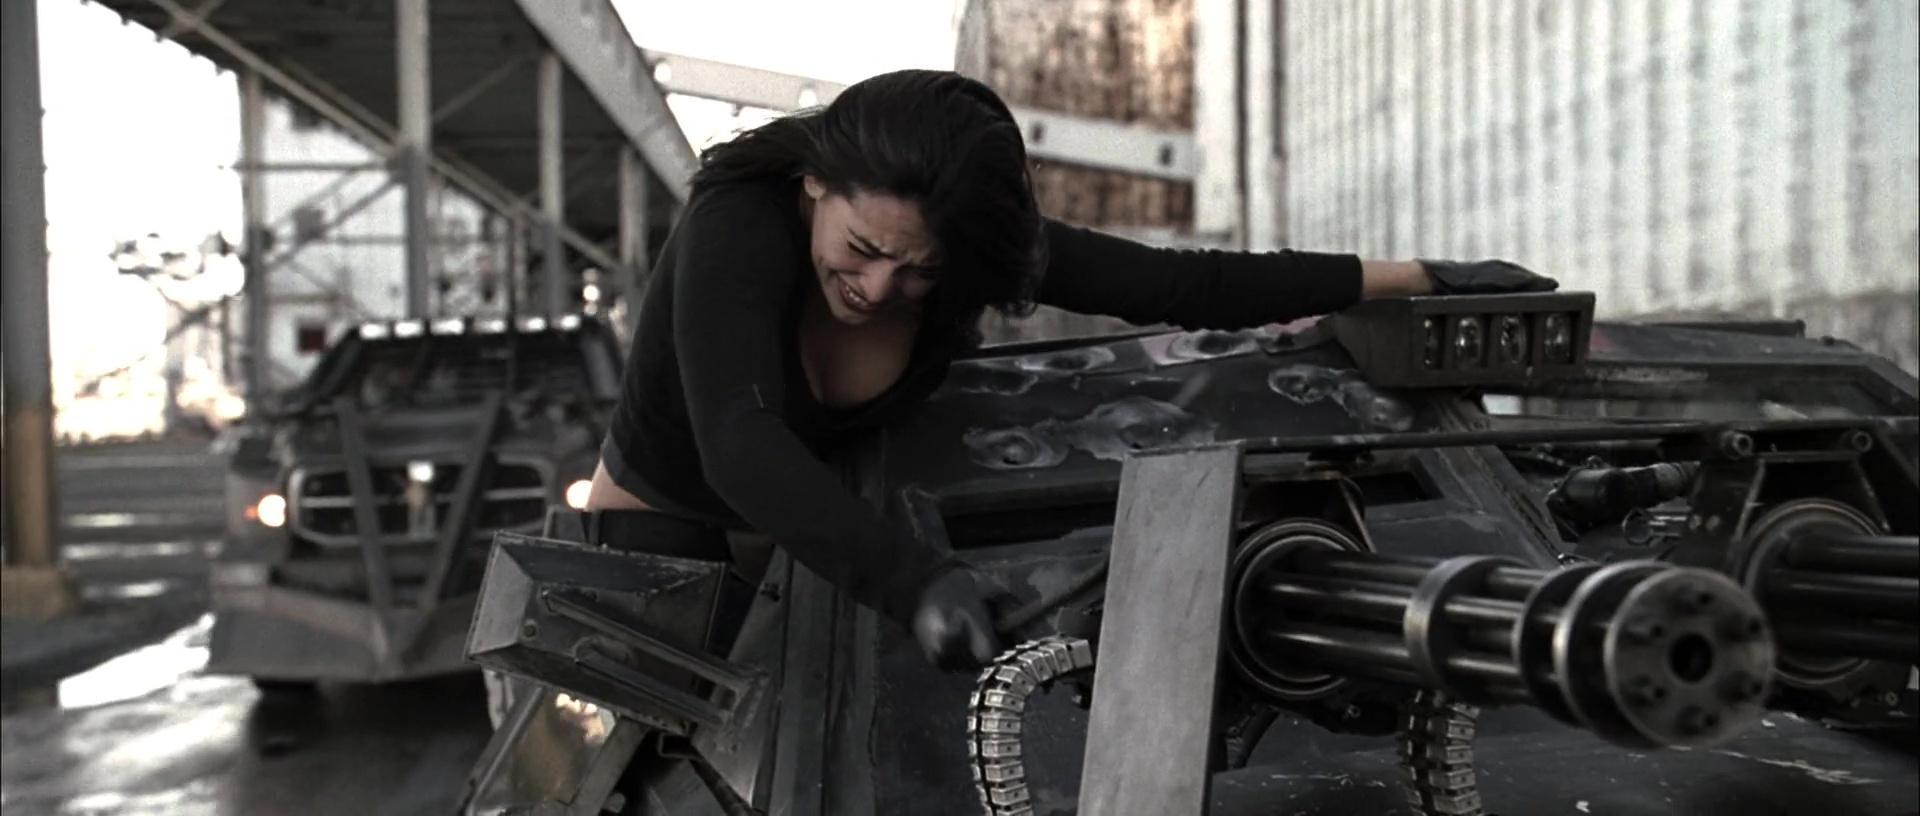 Converger frecuentemente cero  Death Race: La carrera de la muerte (2008) - Filmaffinity